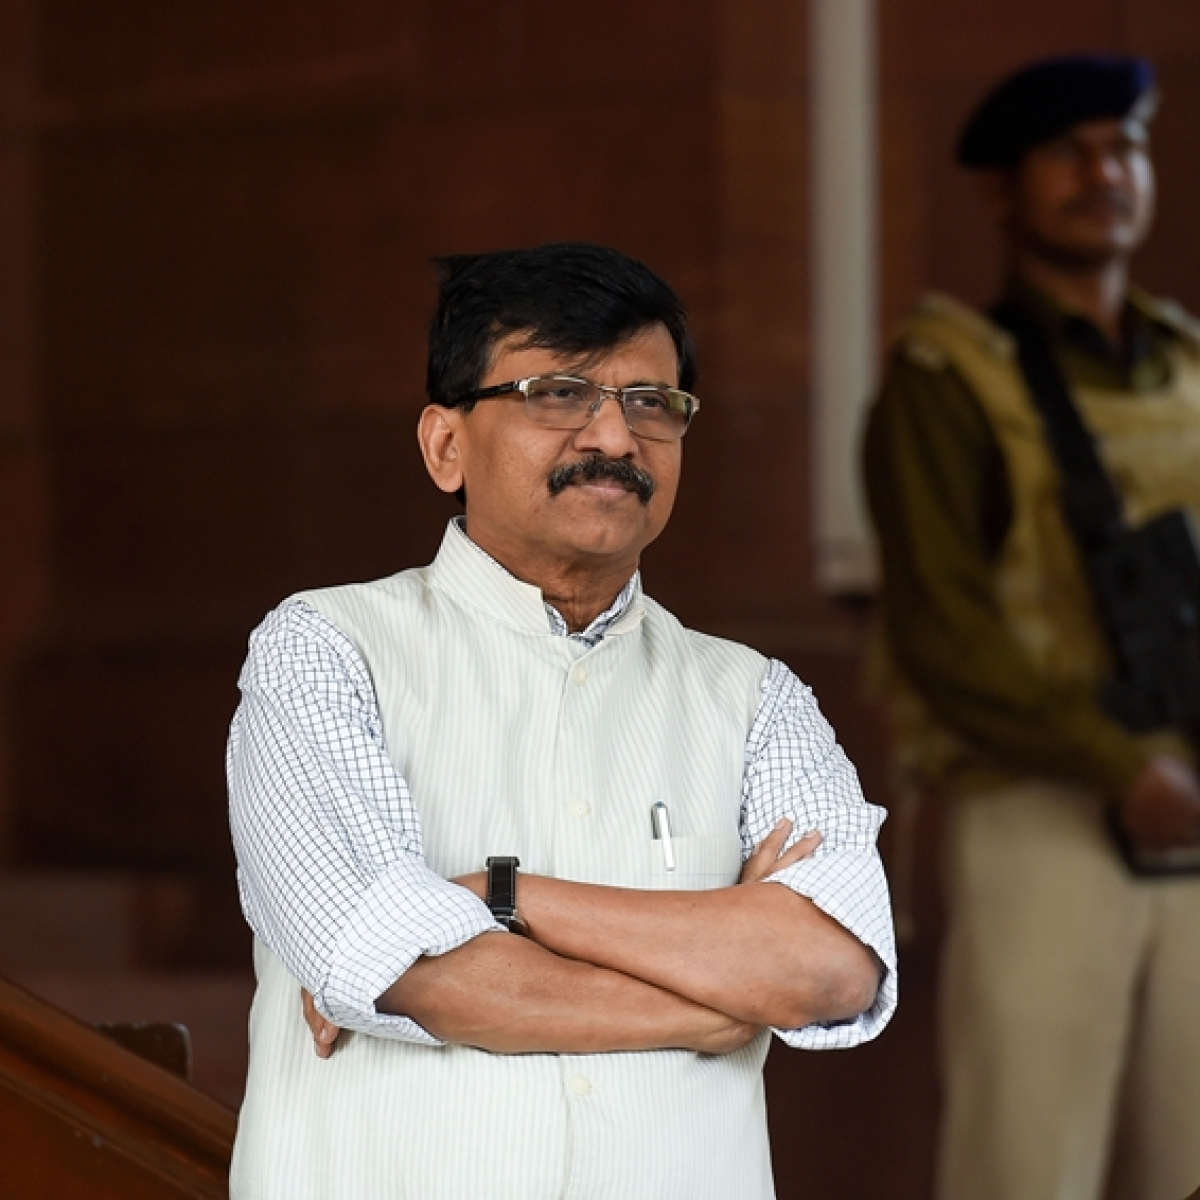 'Better if Mr Poet of Sena recites poetry': Milind Deora, Sanjay Nirupam criticise Raut's remark on Indira Gandhi